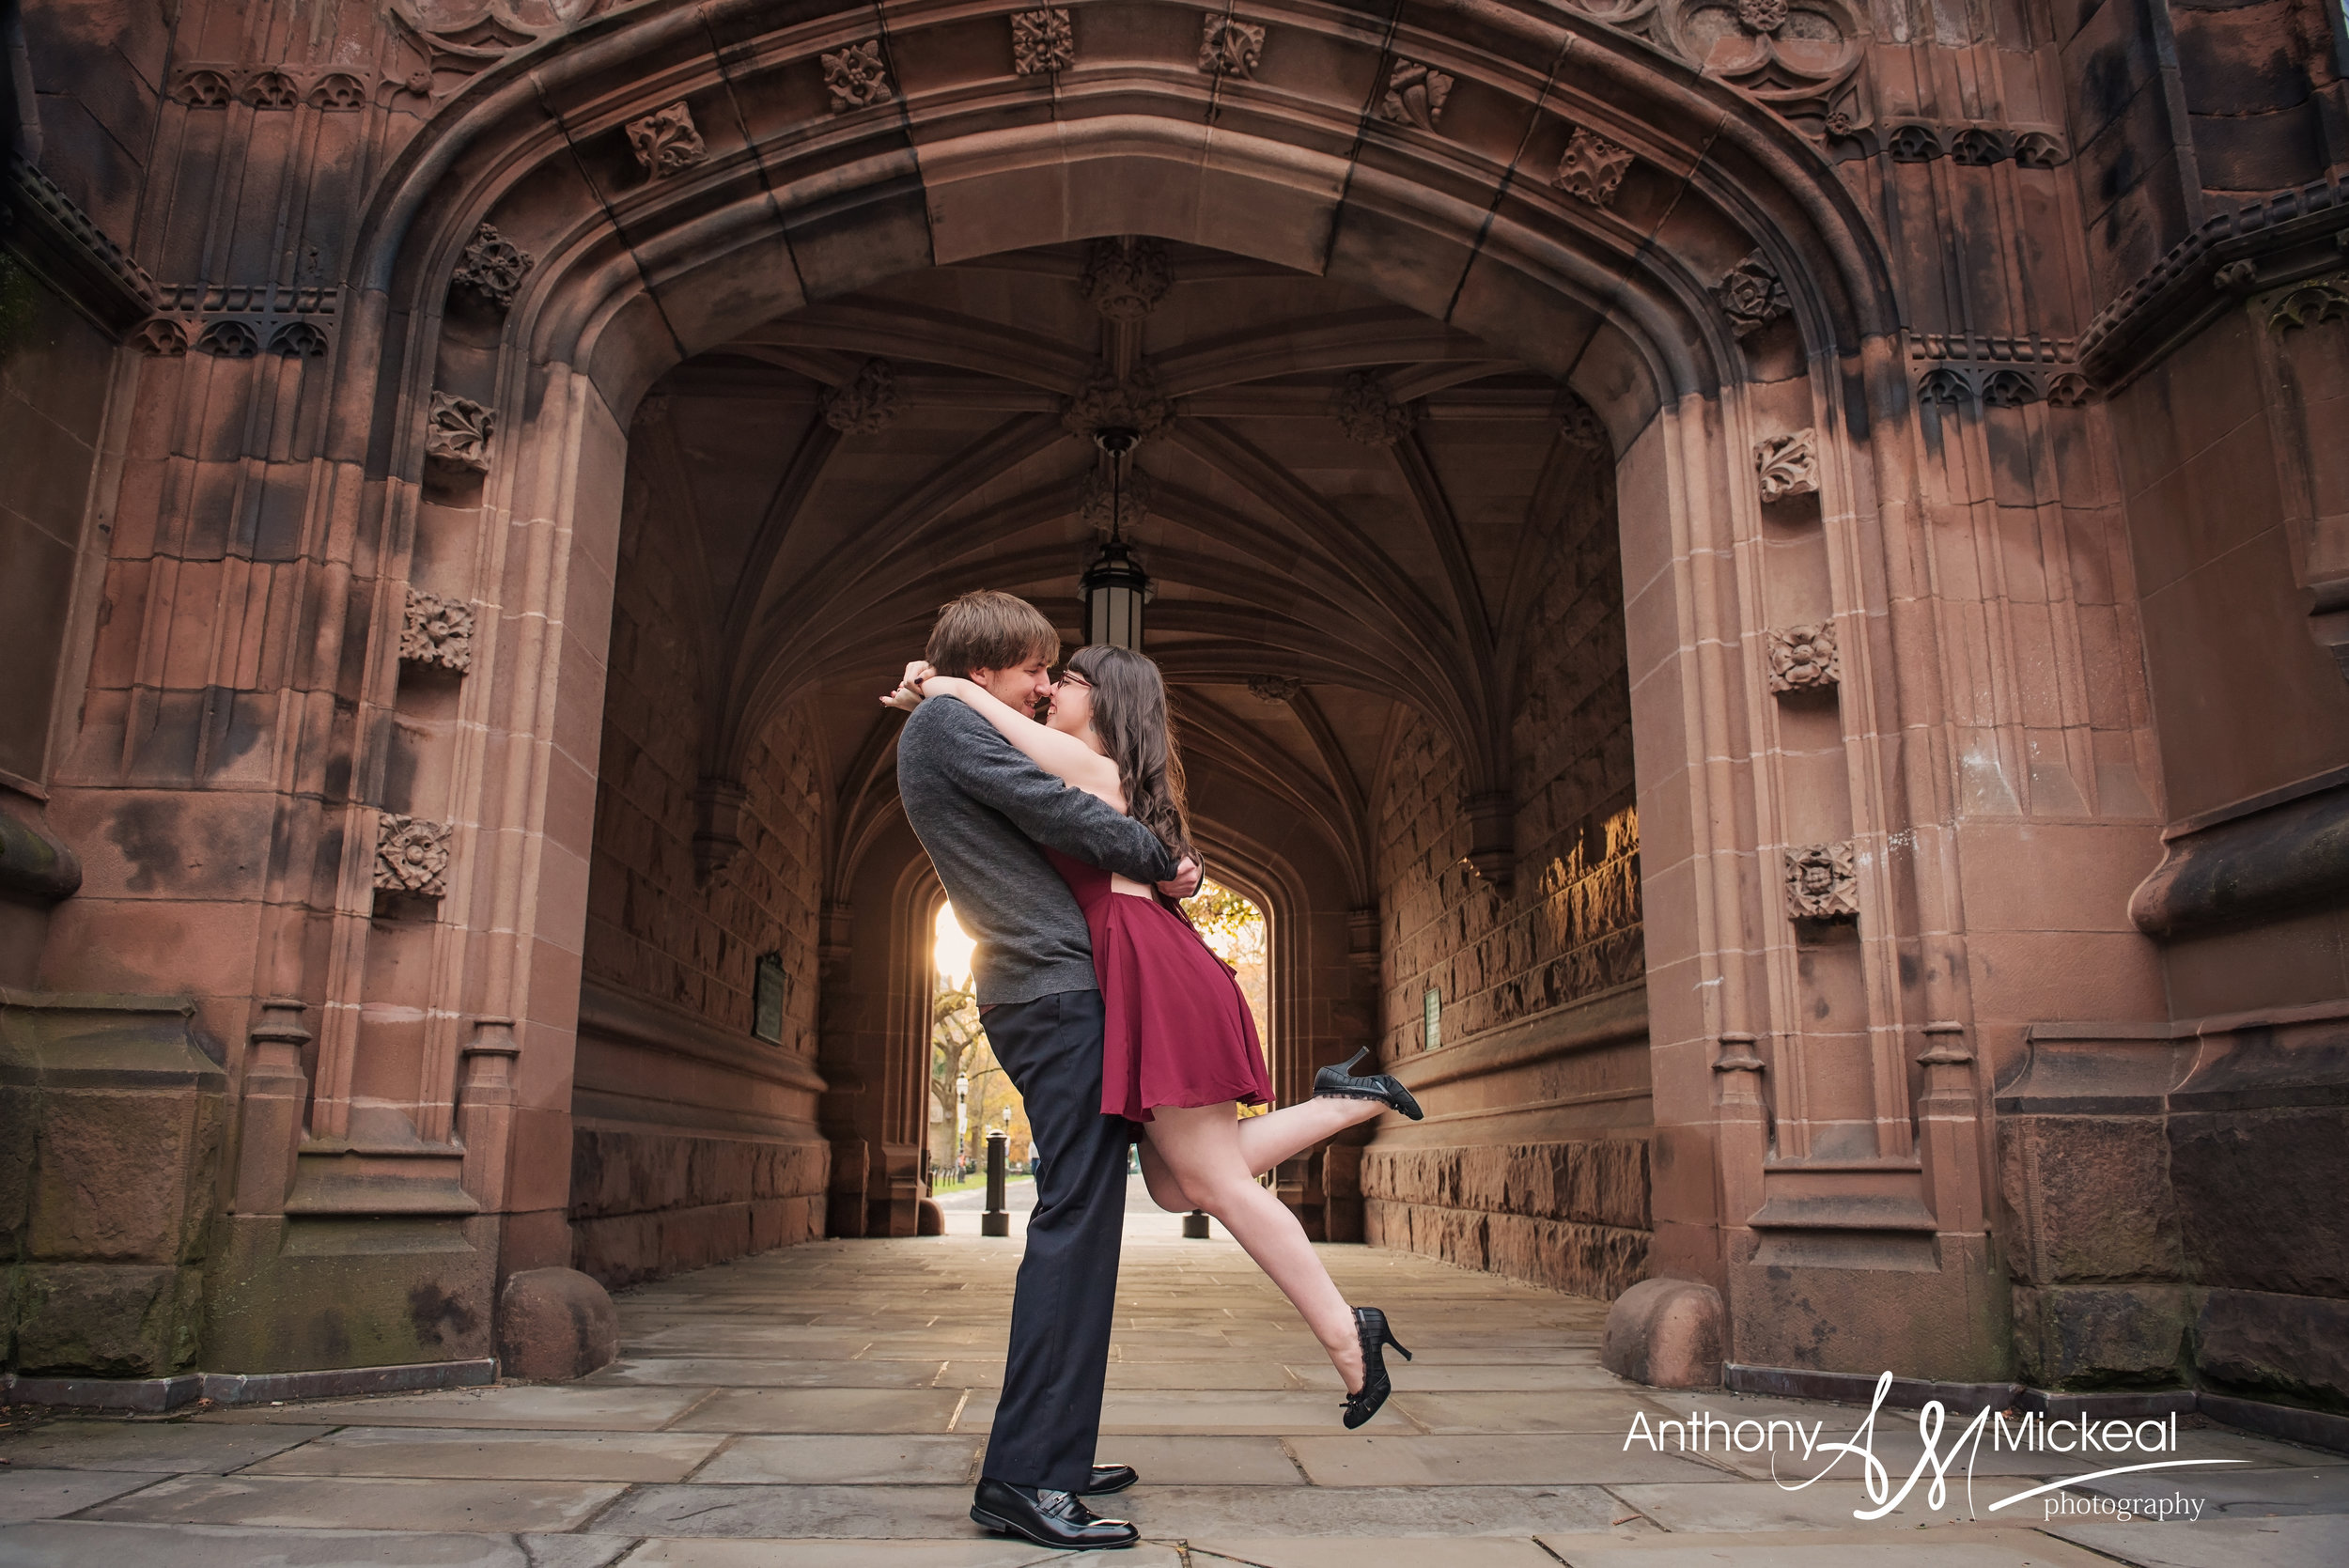 Princeton NJ wedding photographer photography serving NJ NYC and Philly 435612357.jpg